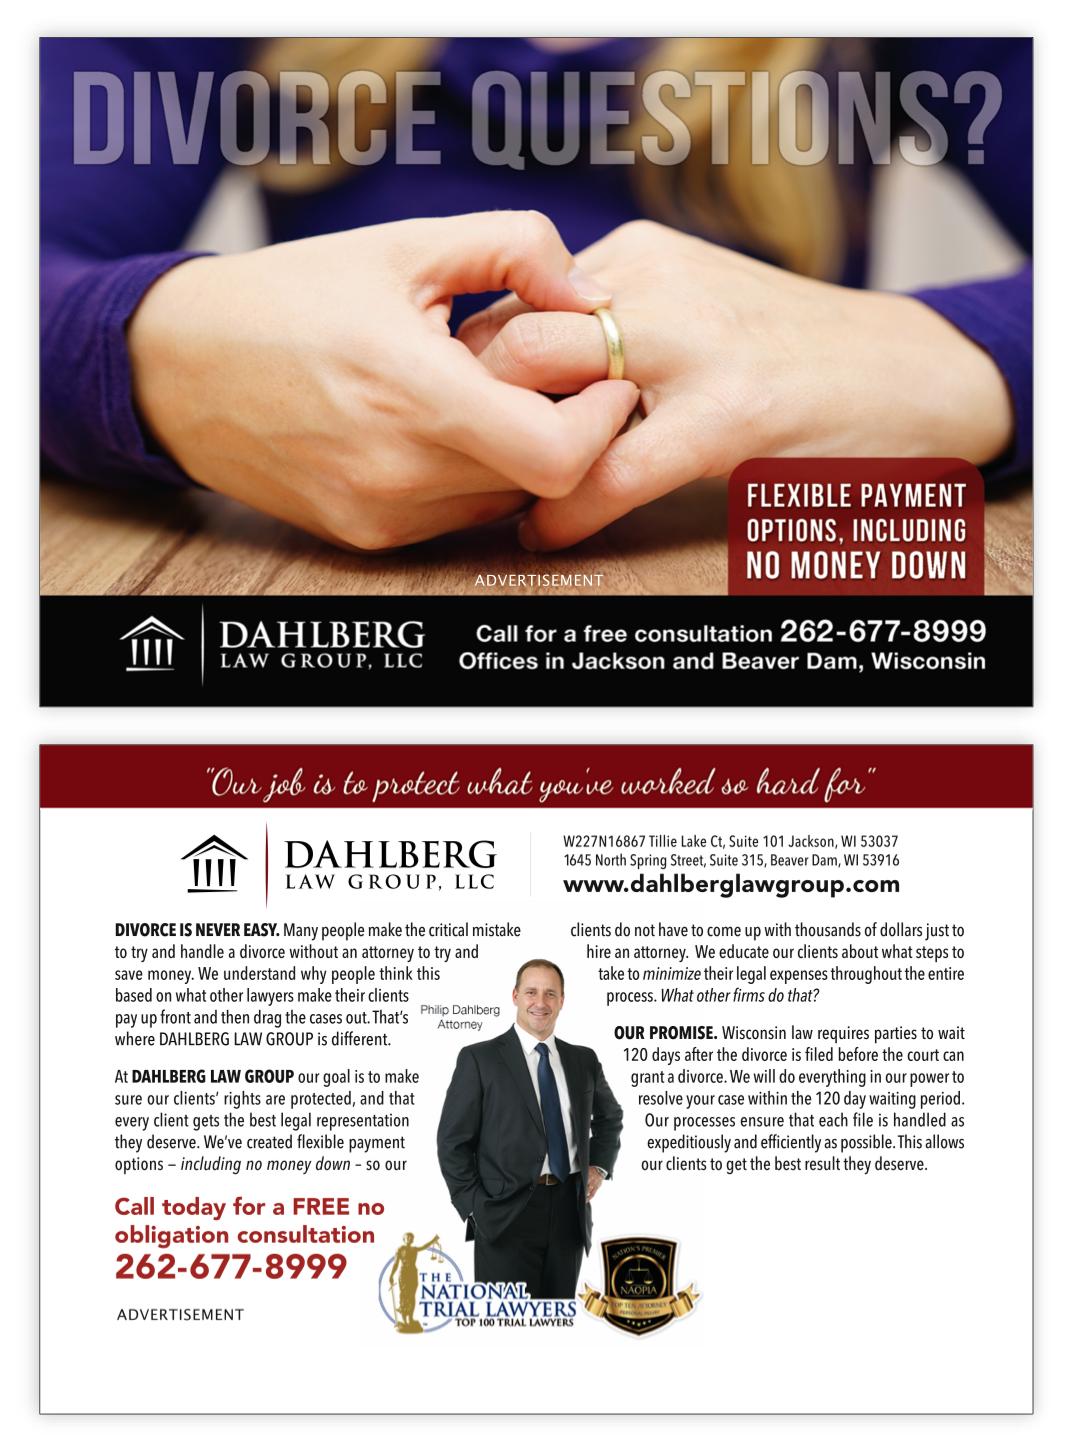 Dahlberg Law Group postcard